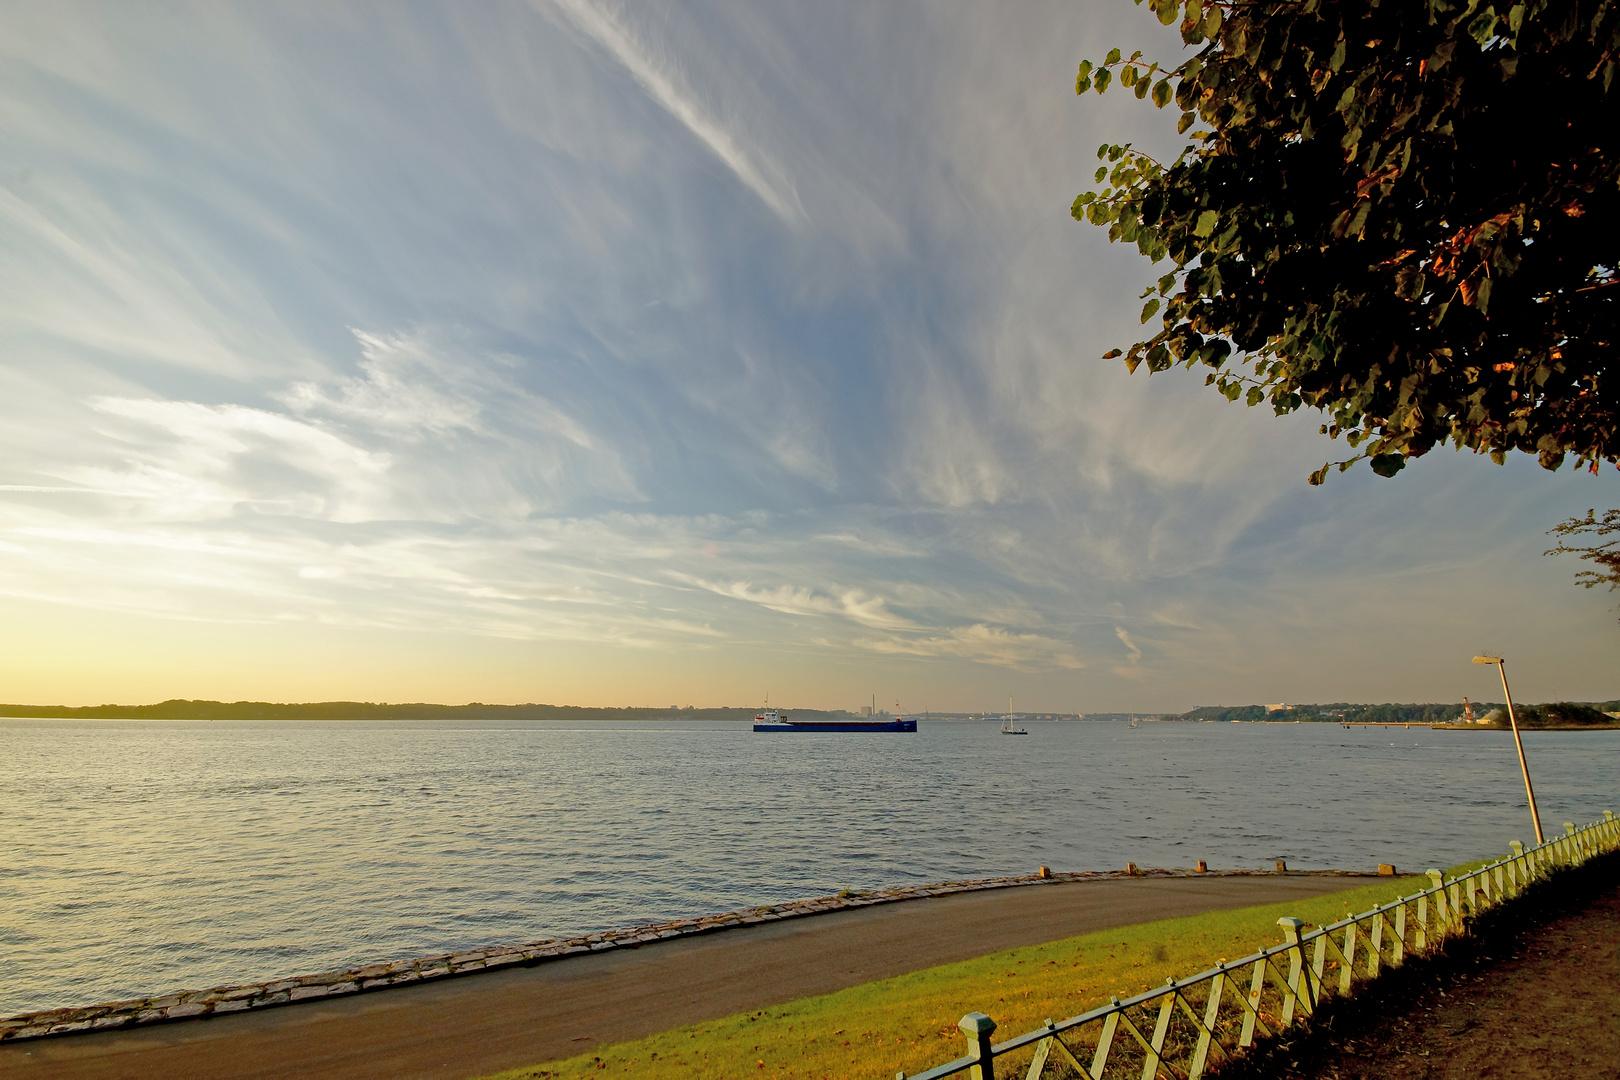 Kieler Förde; Einfahrt zum Nord-Ostsee-Kanal, frühmorgens